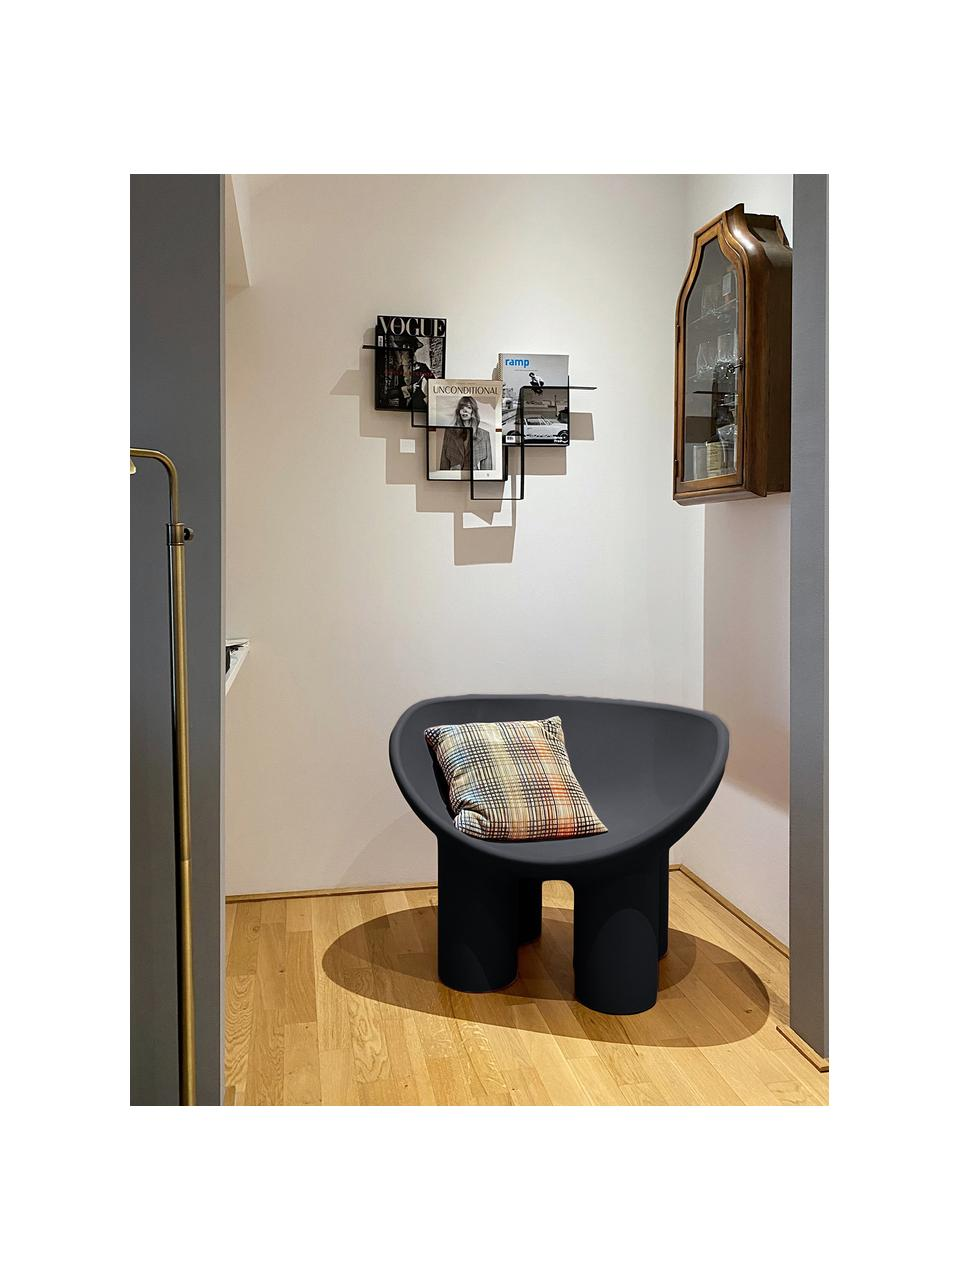 Designer Sessel Roly Poly in Anthrazit, Polyethylen, im Rotationsgussverfahren hergestellt, Anthrazit, B 84 x T 57 cm